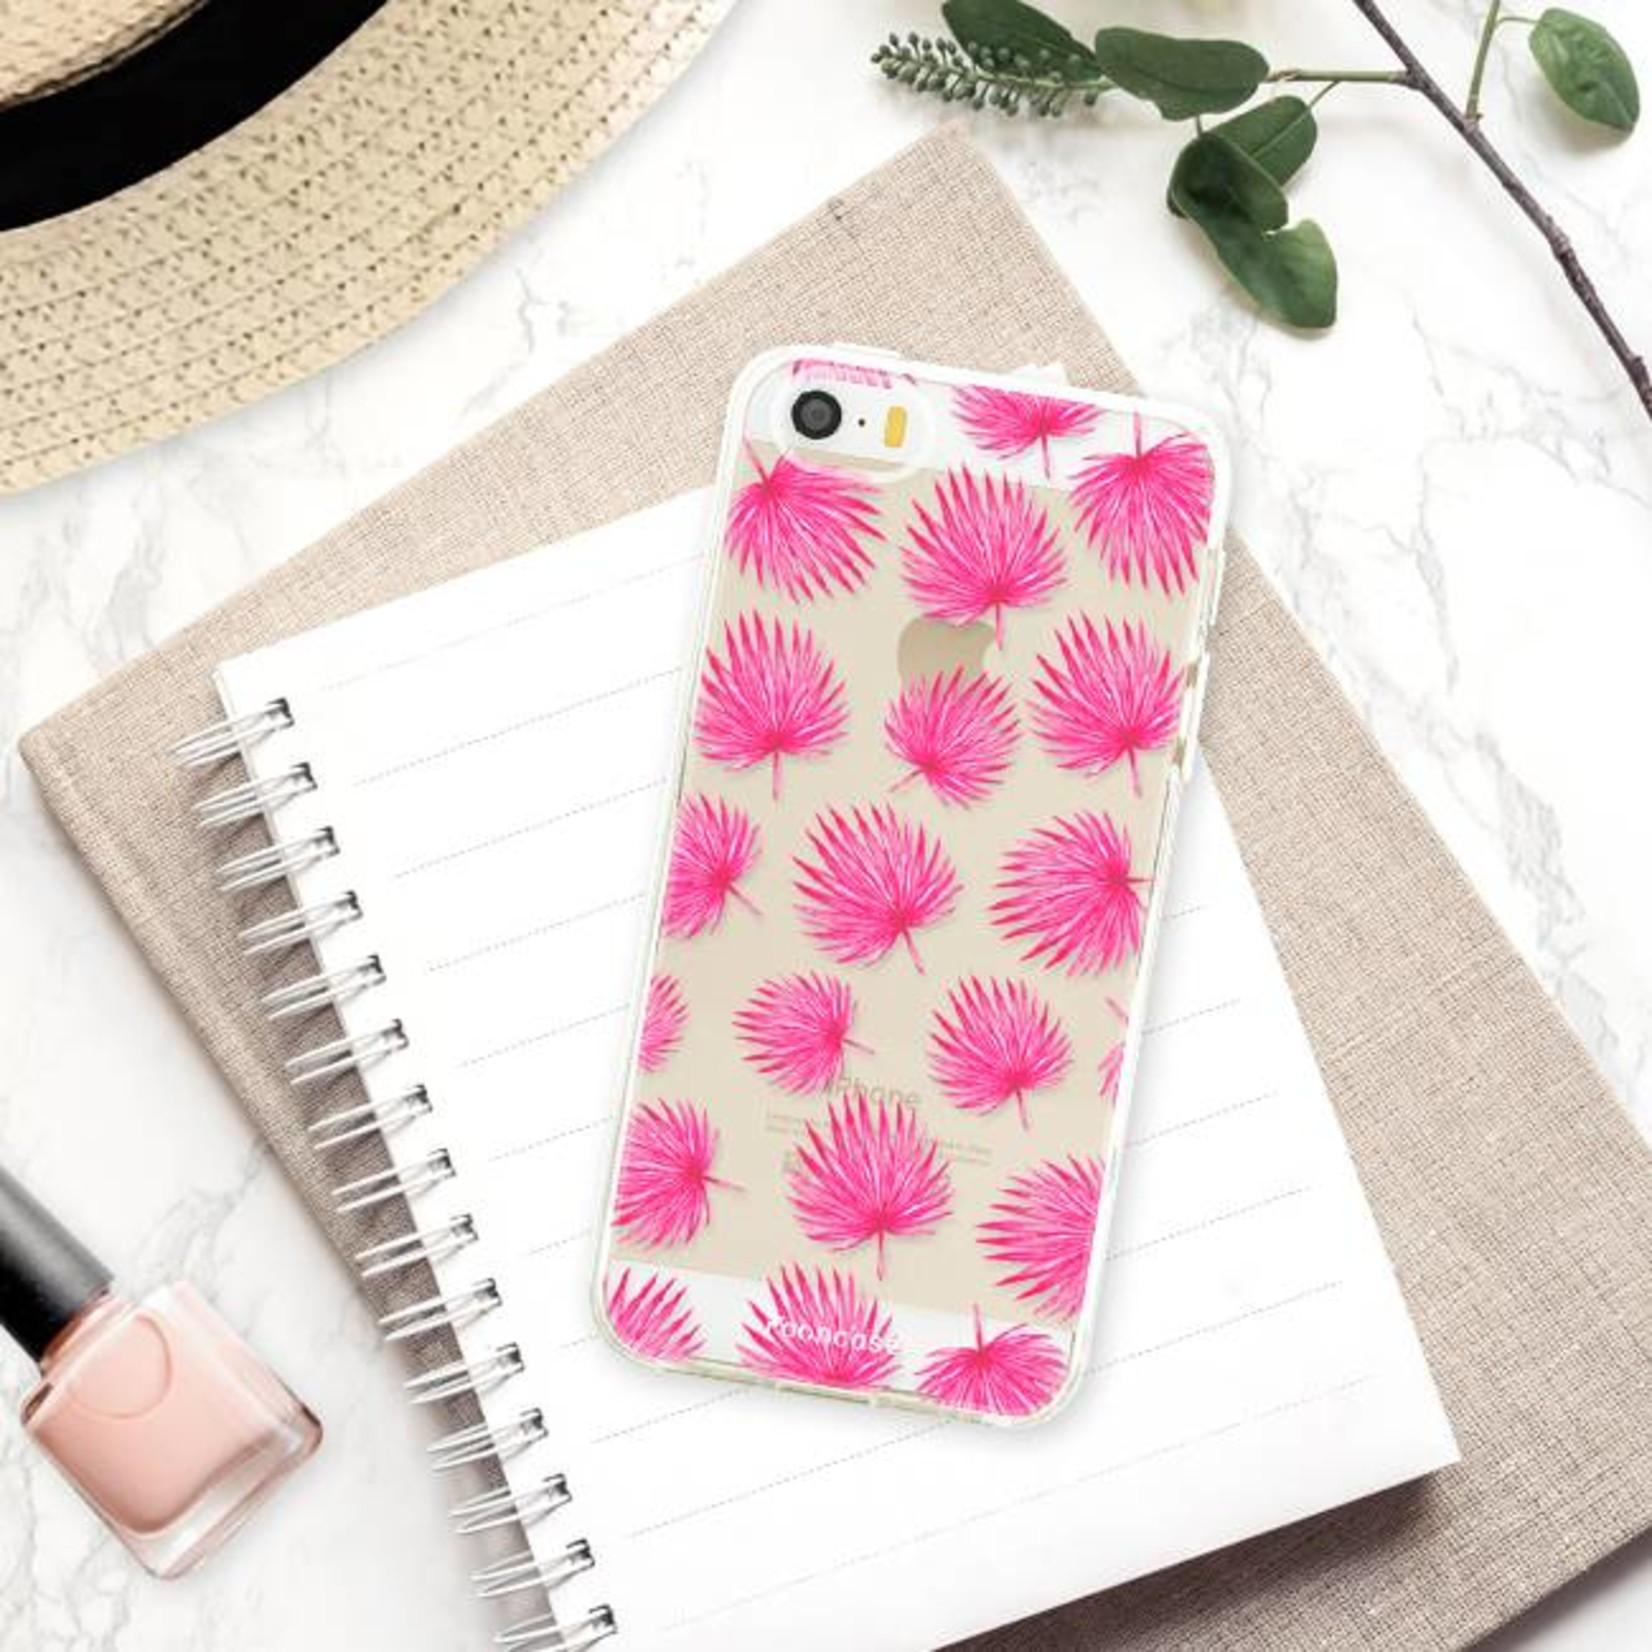 FOONCASE Iphone 5 / 5S Handyhülle - Rosa Blätter